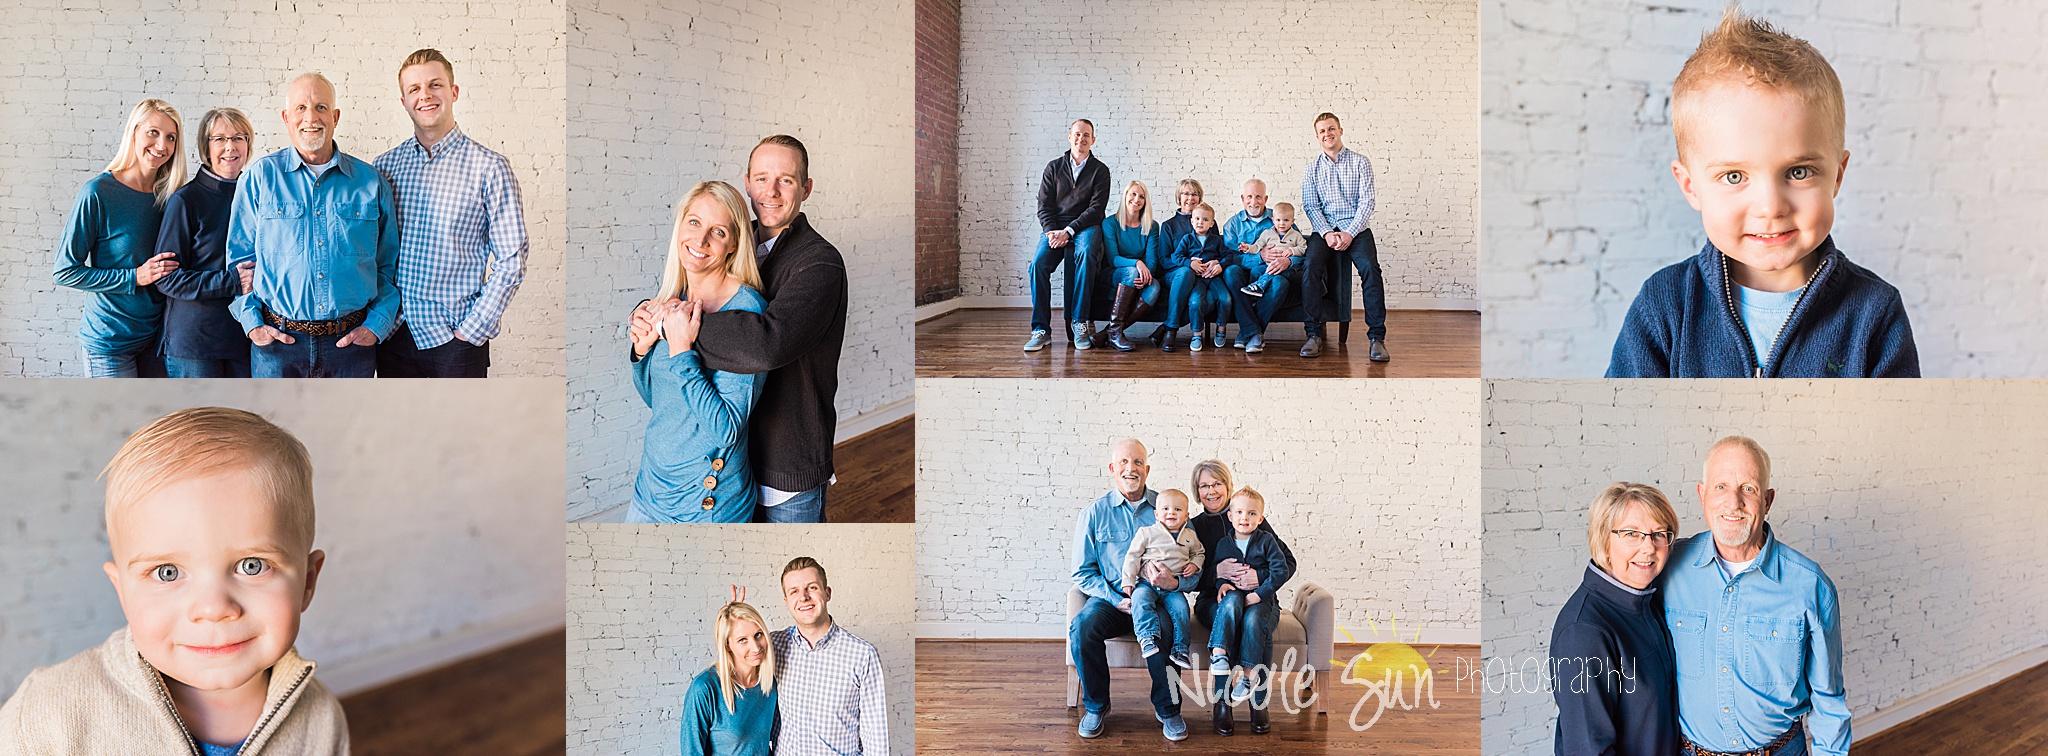 dfwextendedfamilyphotography.jpg